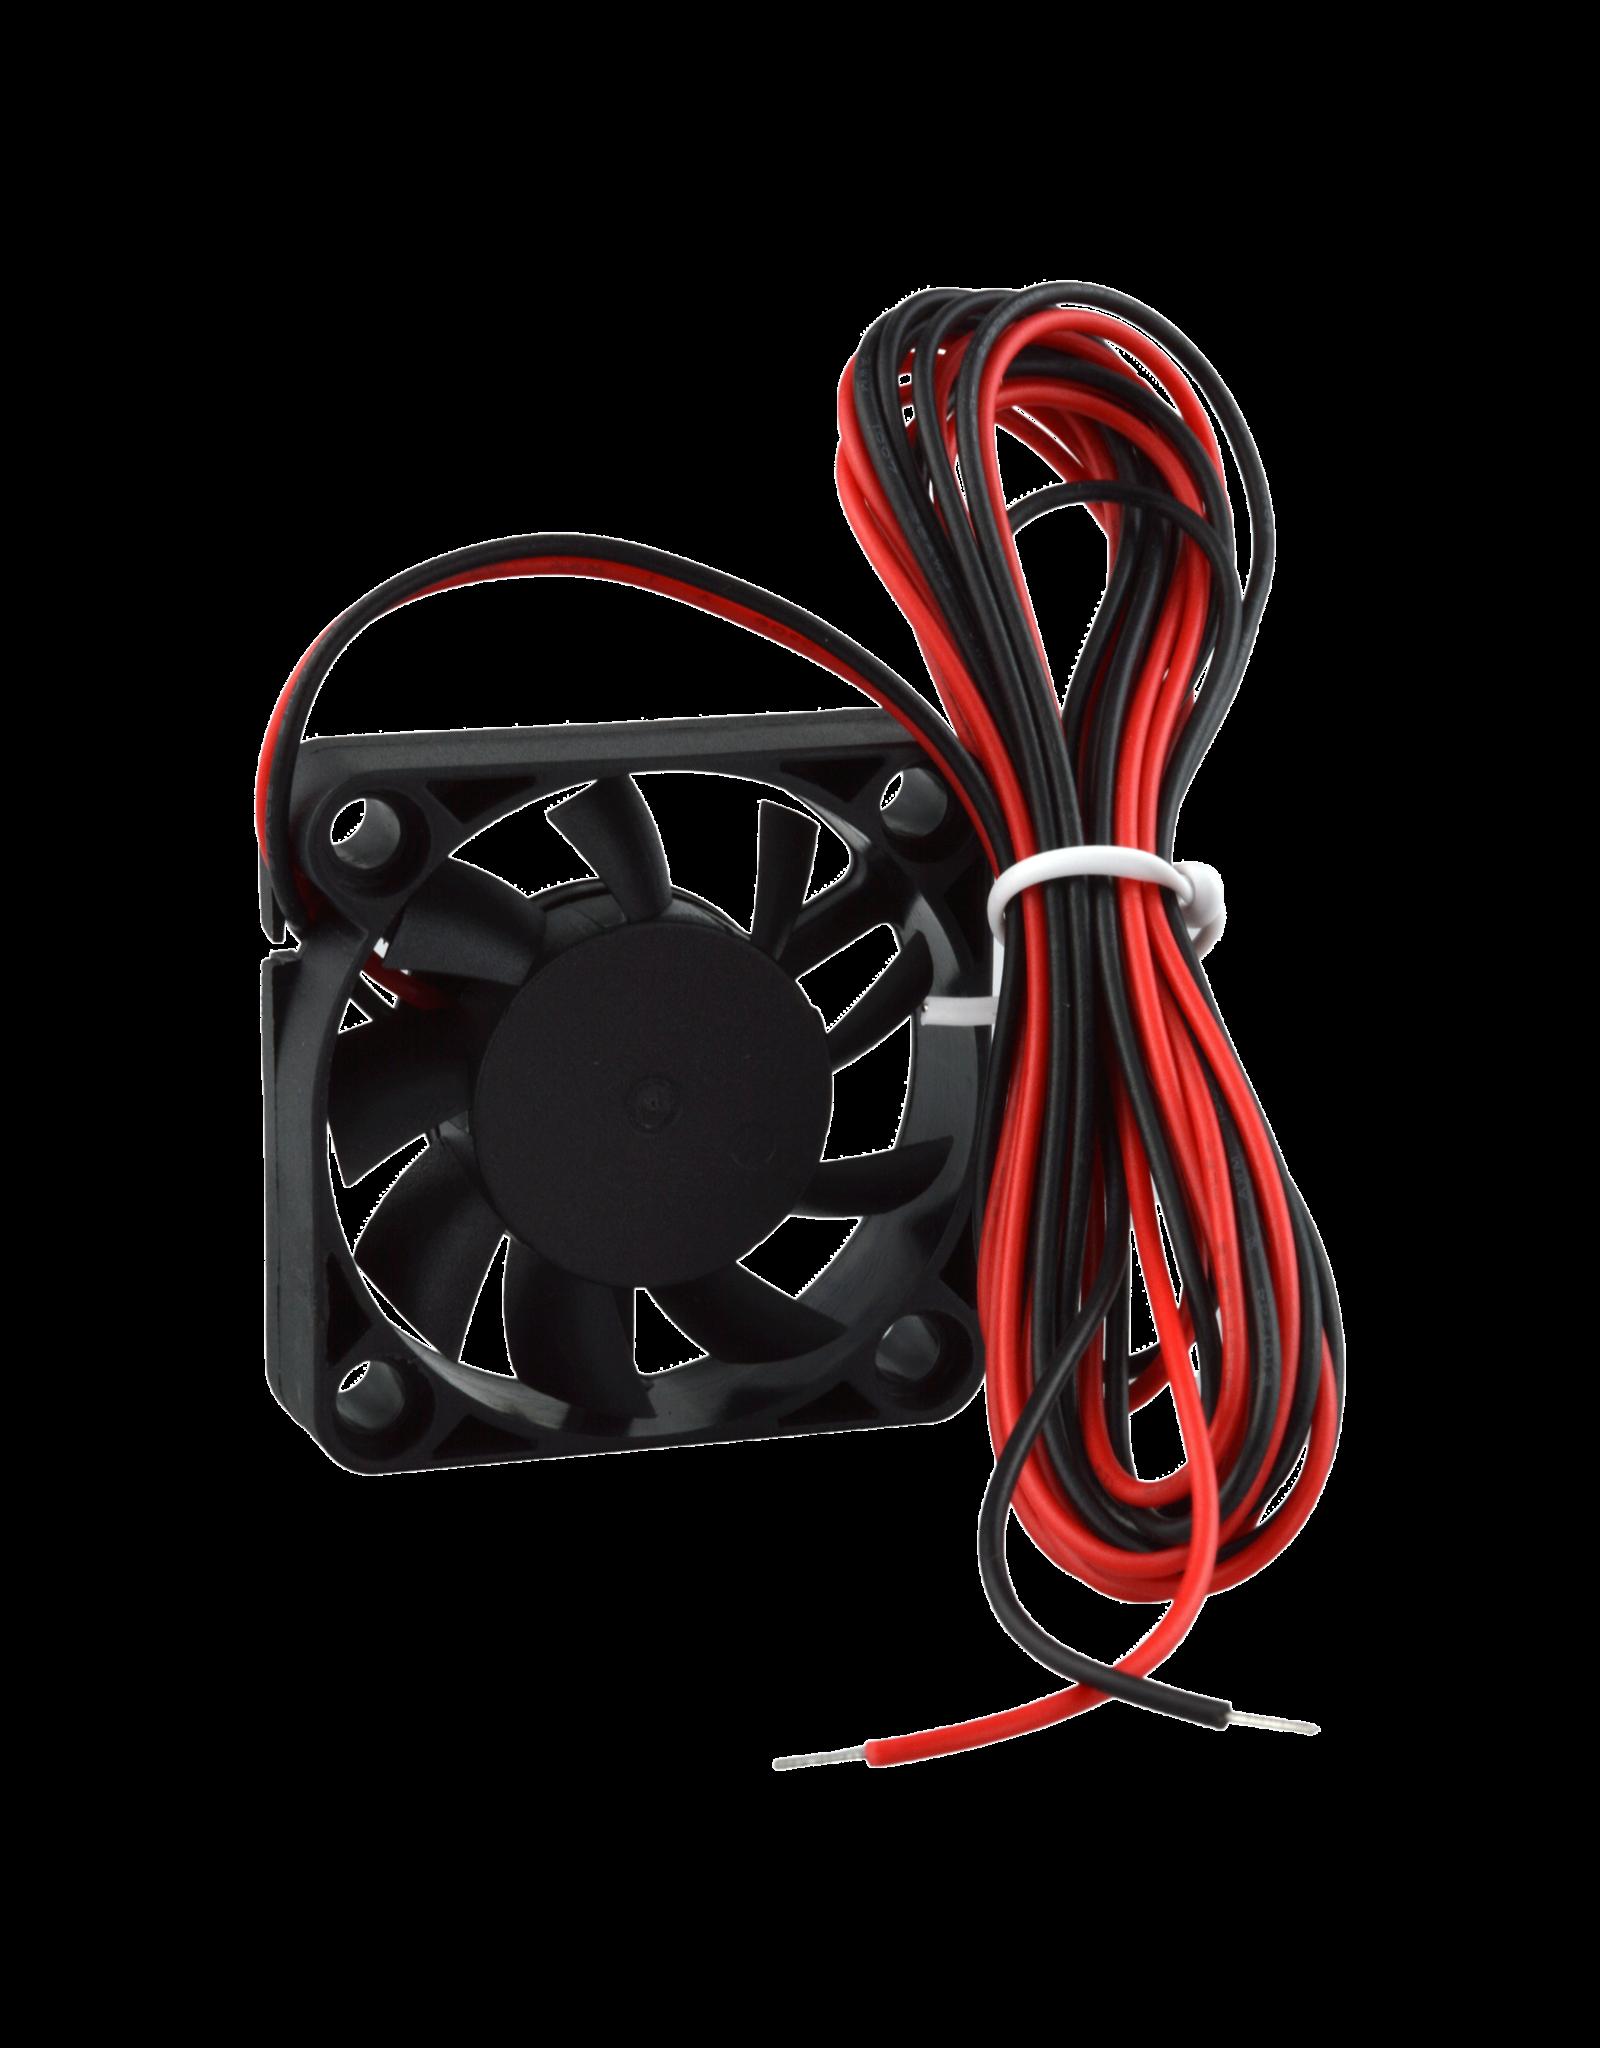 Creality/Ender Creality 3D Ender 3 V2 axiale ventilator